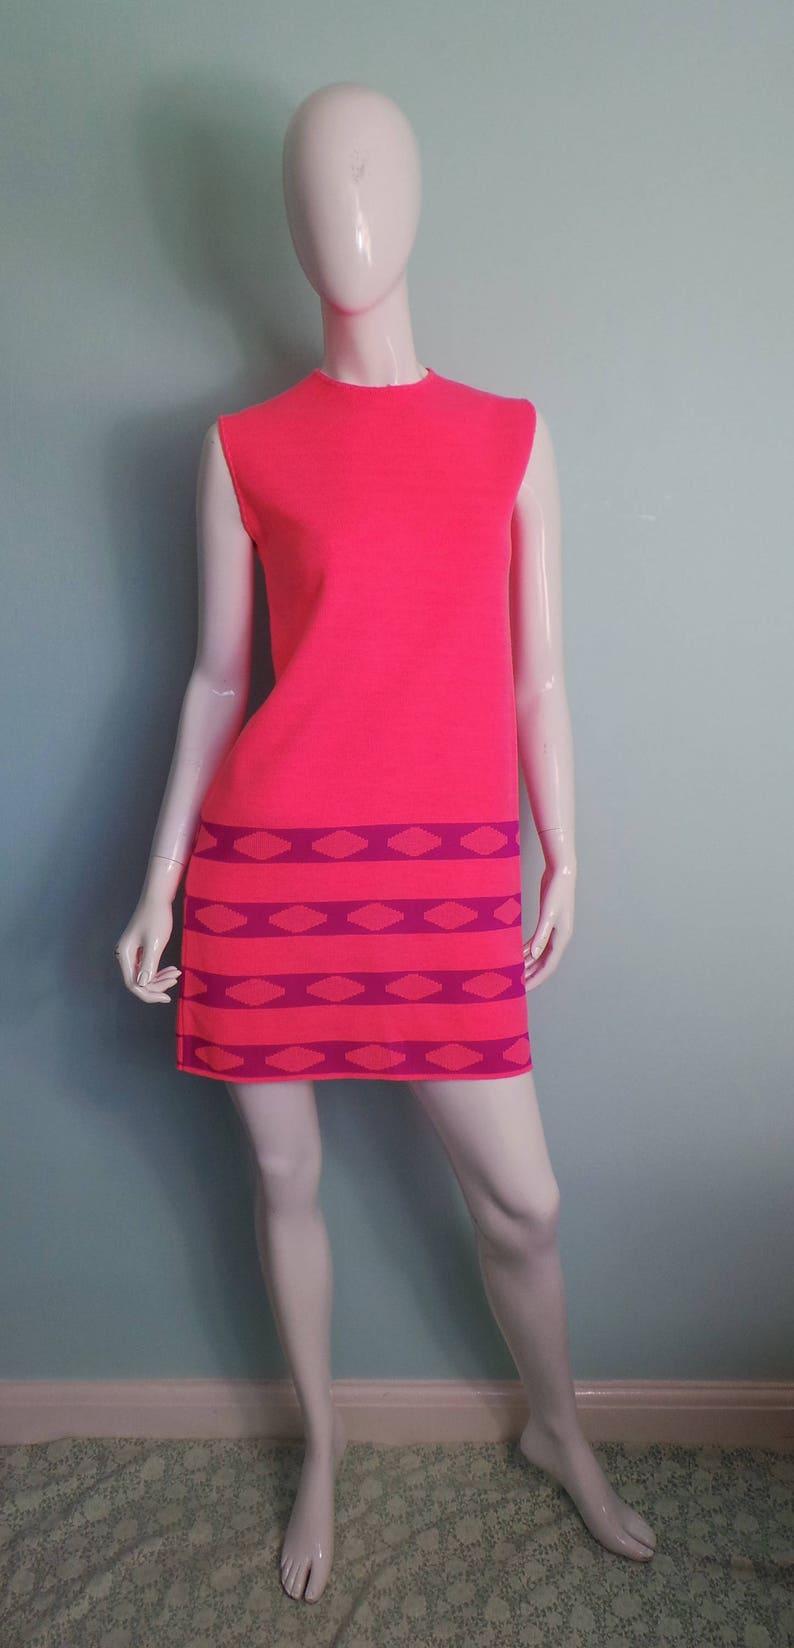 Regular Neon Hot Pink Short Dresses